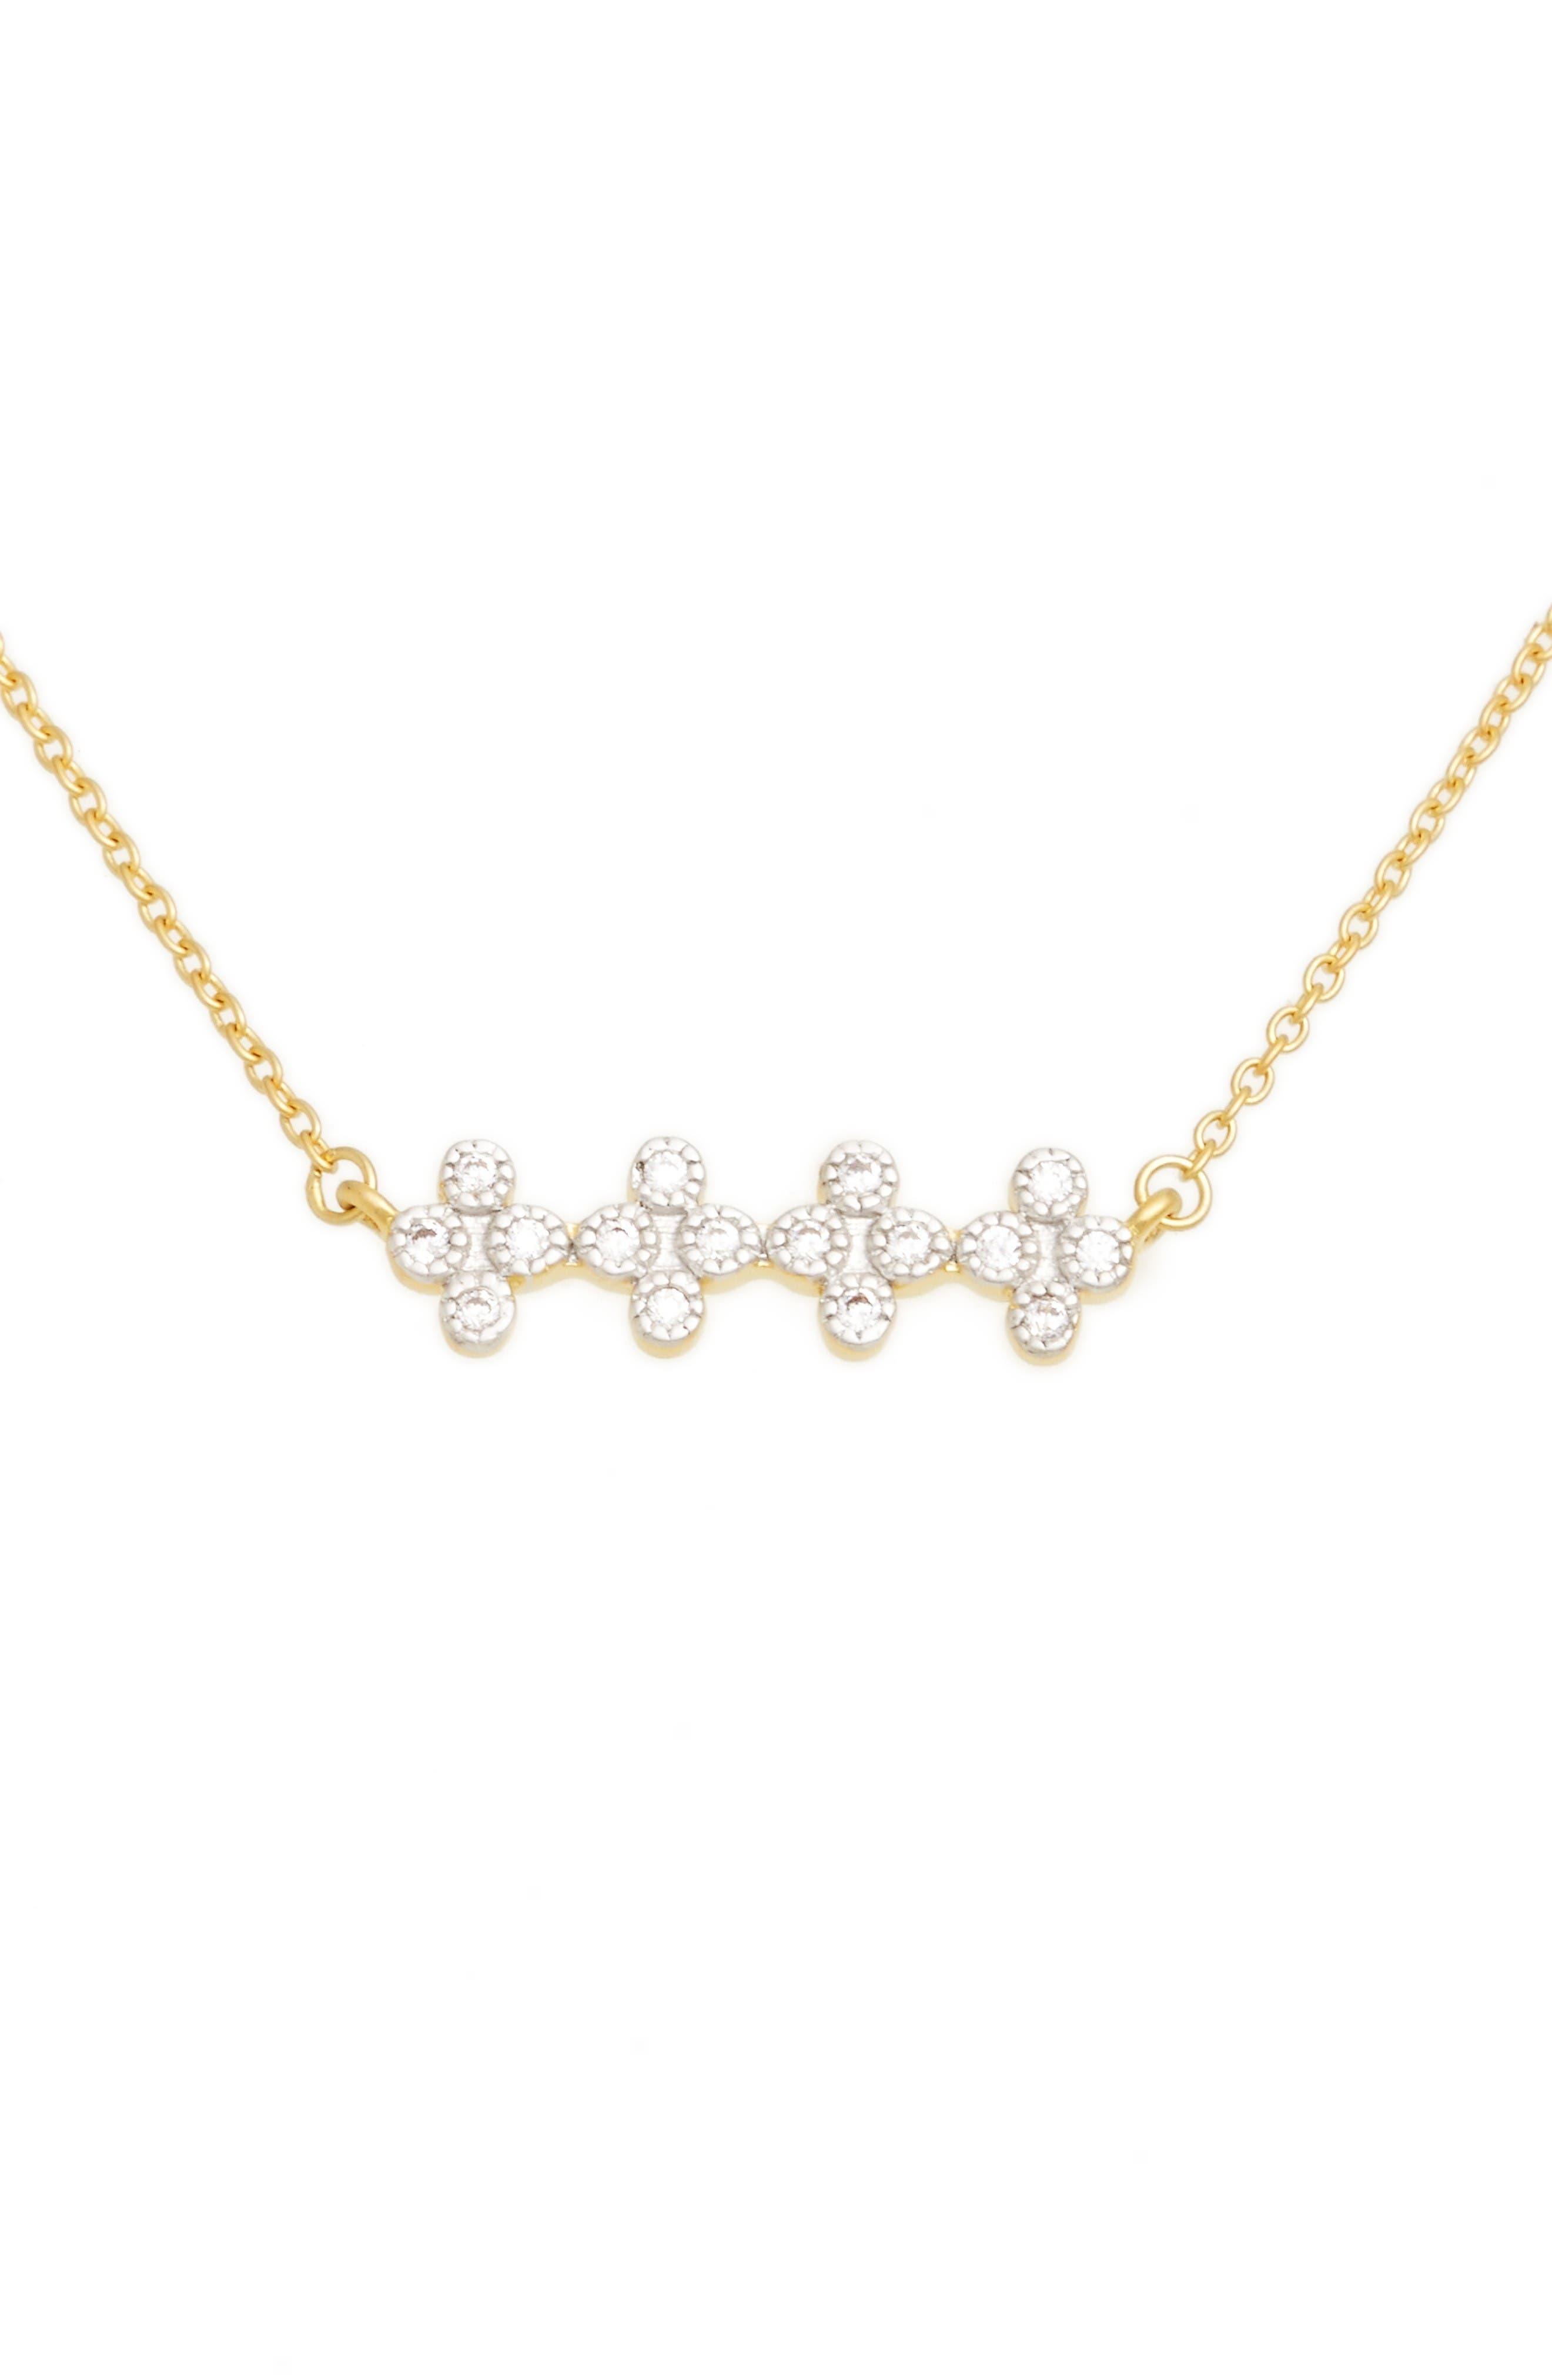 Main Image - FREIDA ROTHMAN Visionary Fusion Crystal Necklace